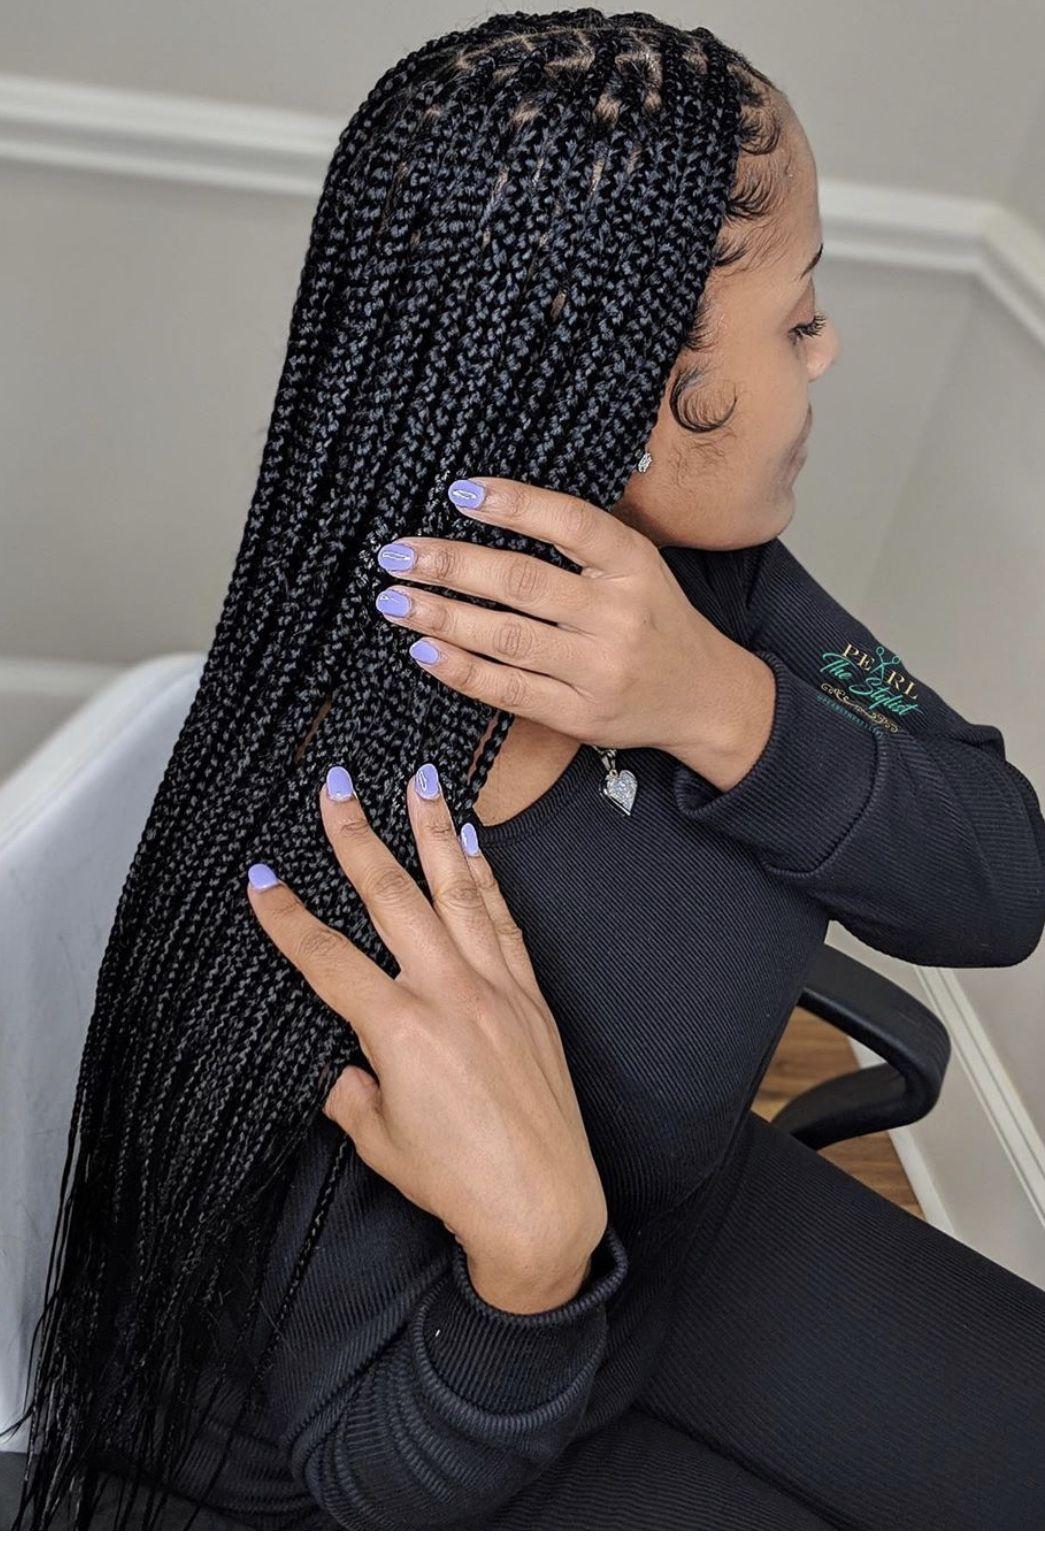 Braided Hairstyles for Little Girls hairstyleforblackwomen.net 303